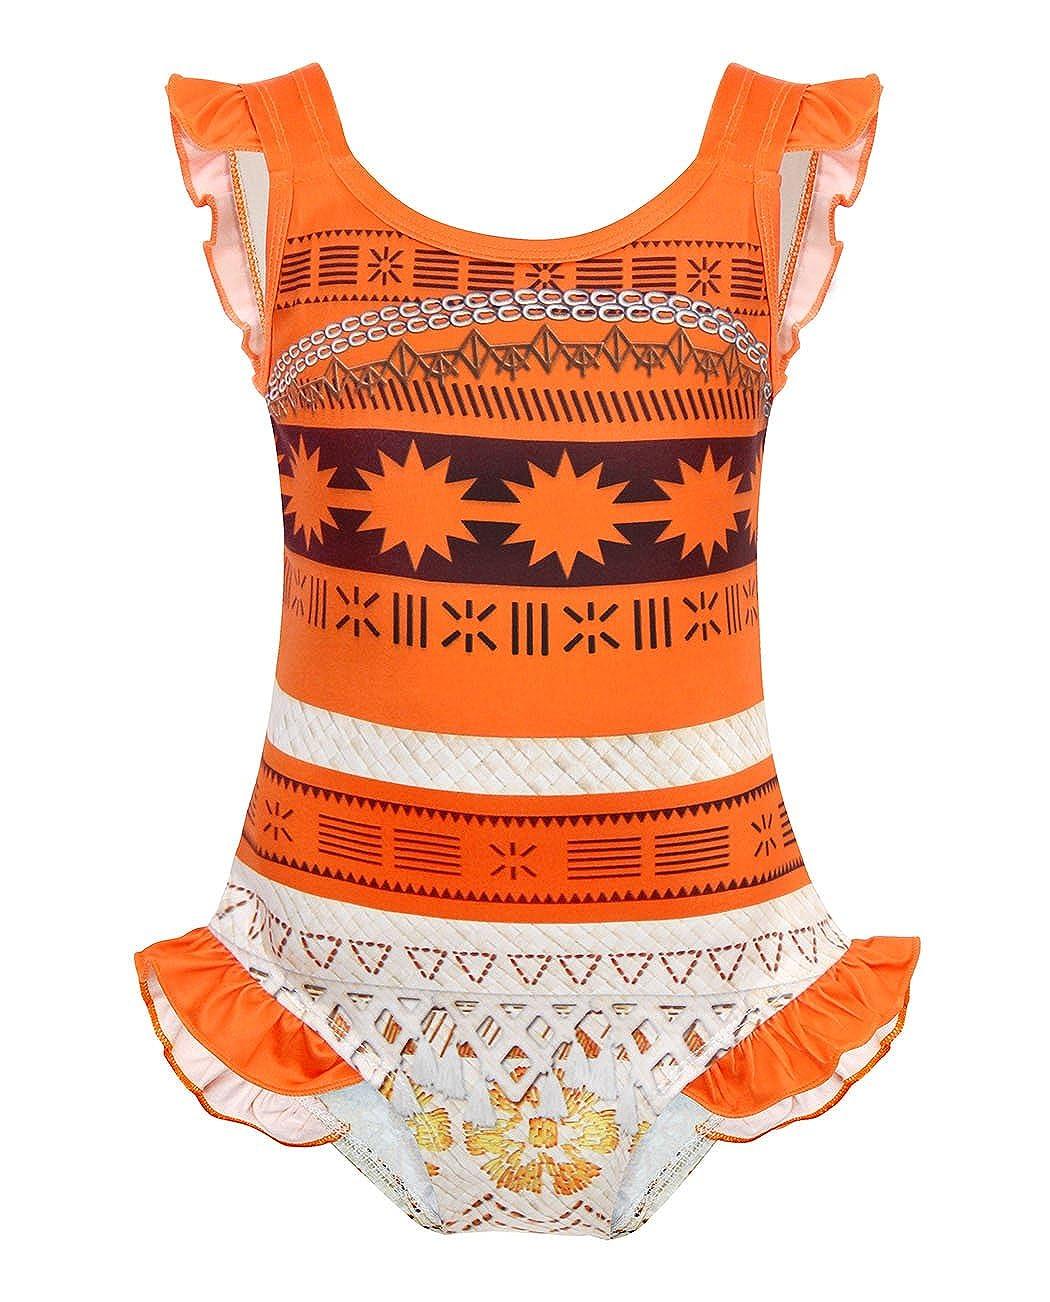 AmzBarley Moana Swimming Costume Swimsuit Swimwear for Kids Girls Pool Beach Bathing Suit